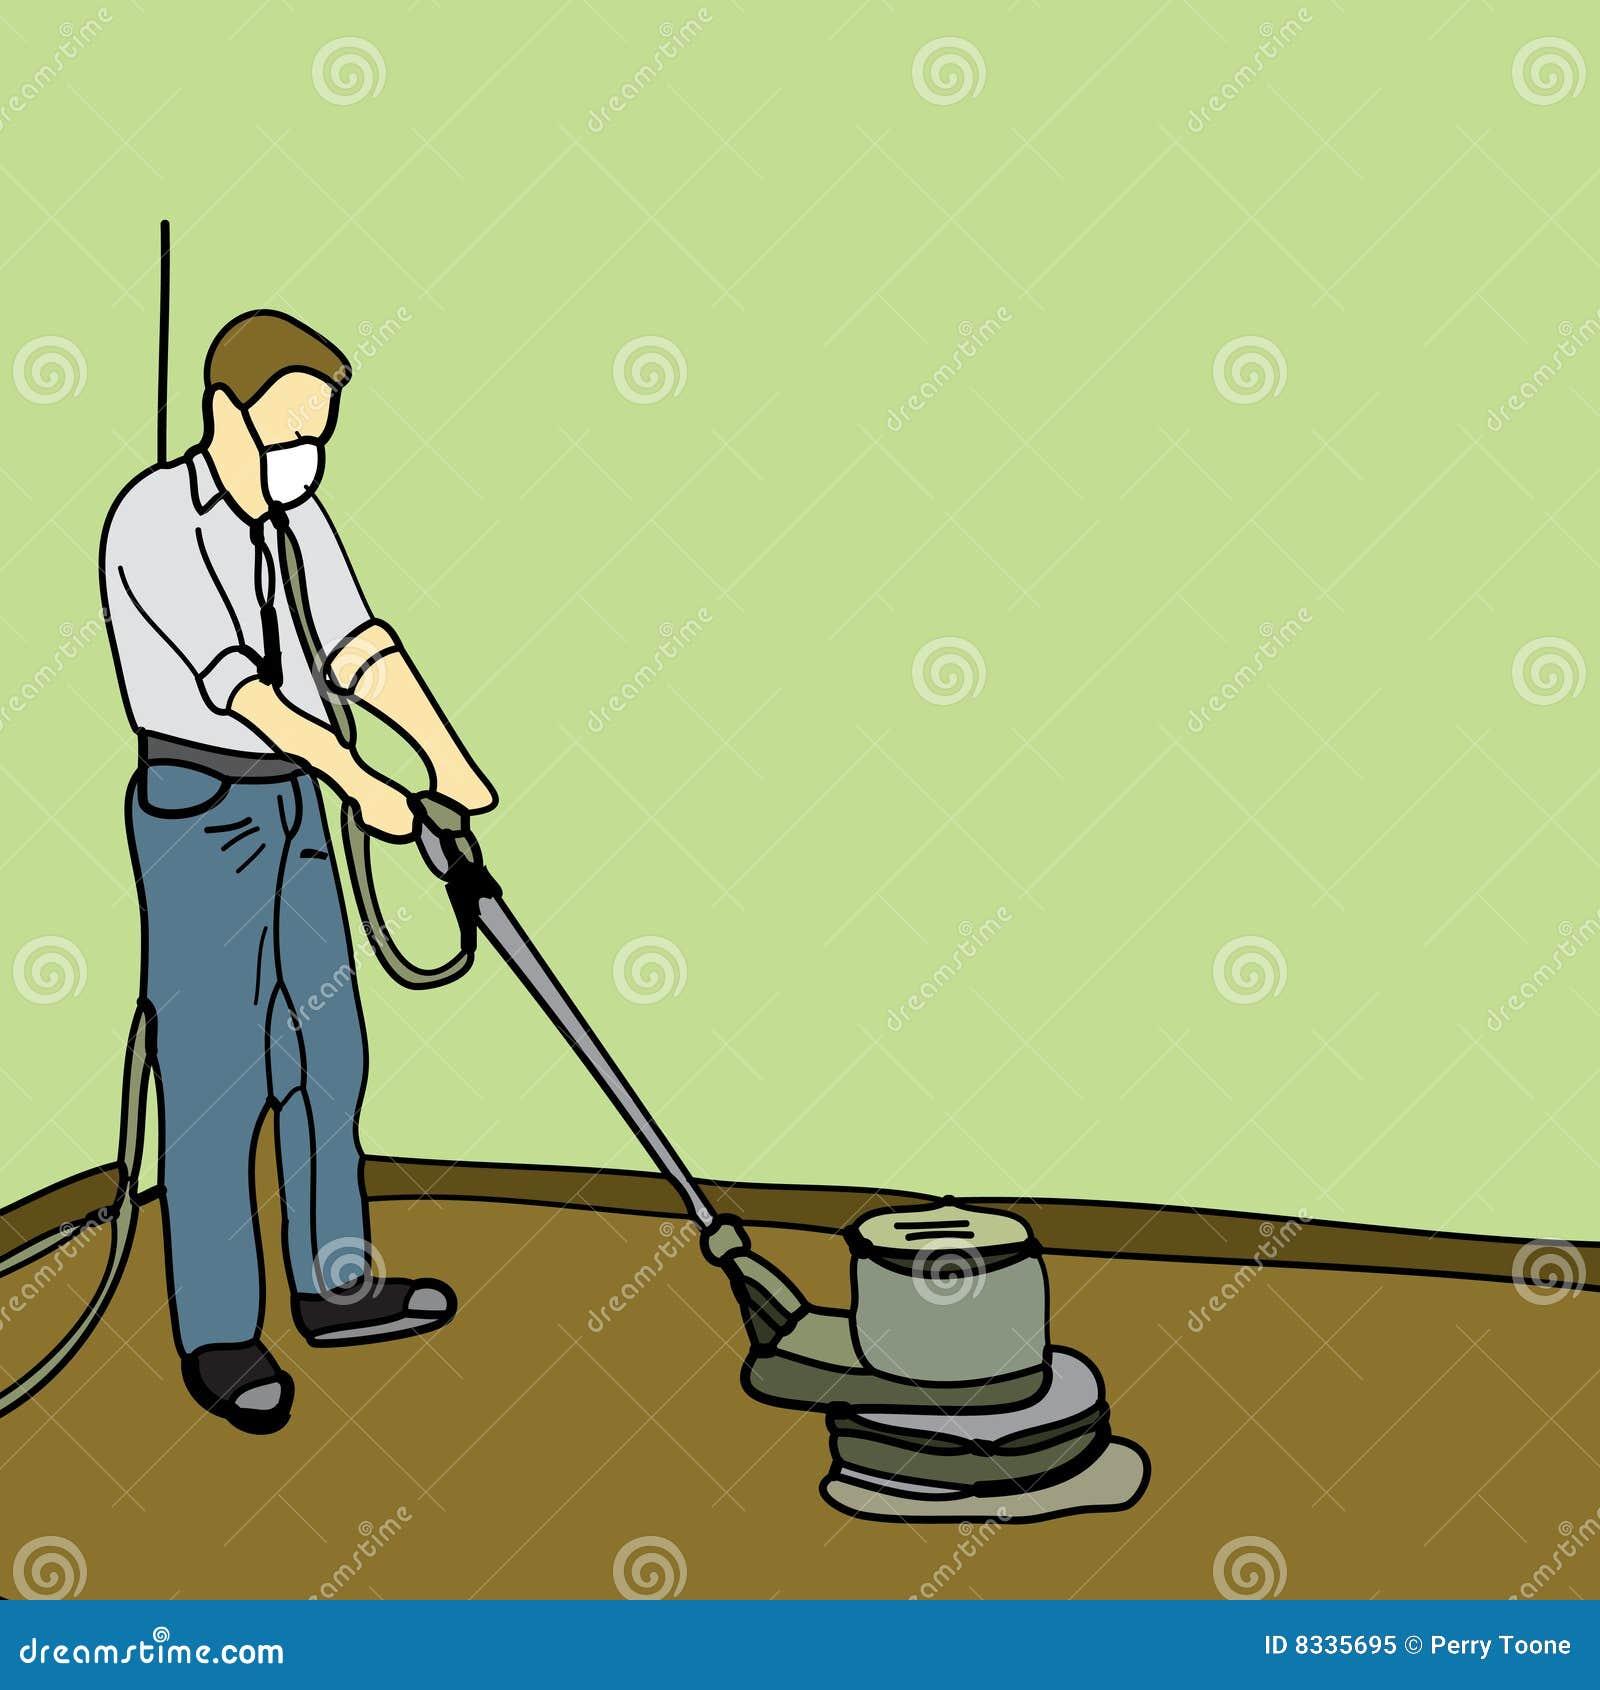 man using an orbital sanding machine to refinish a wooden floor.